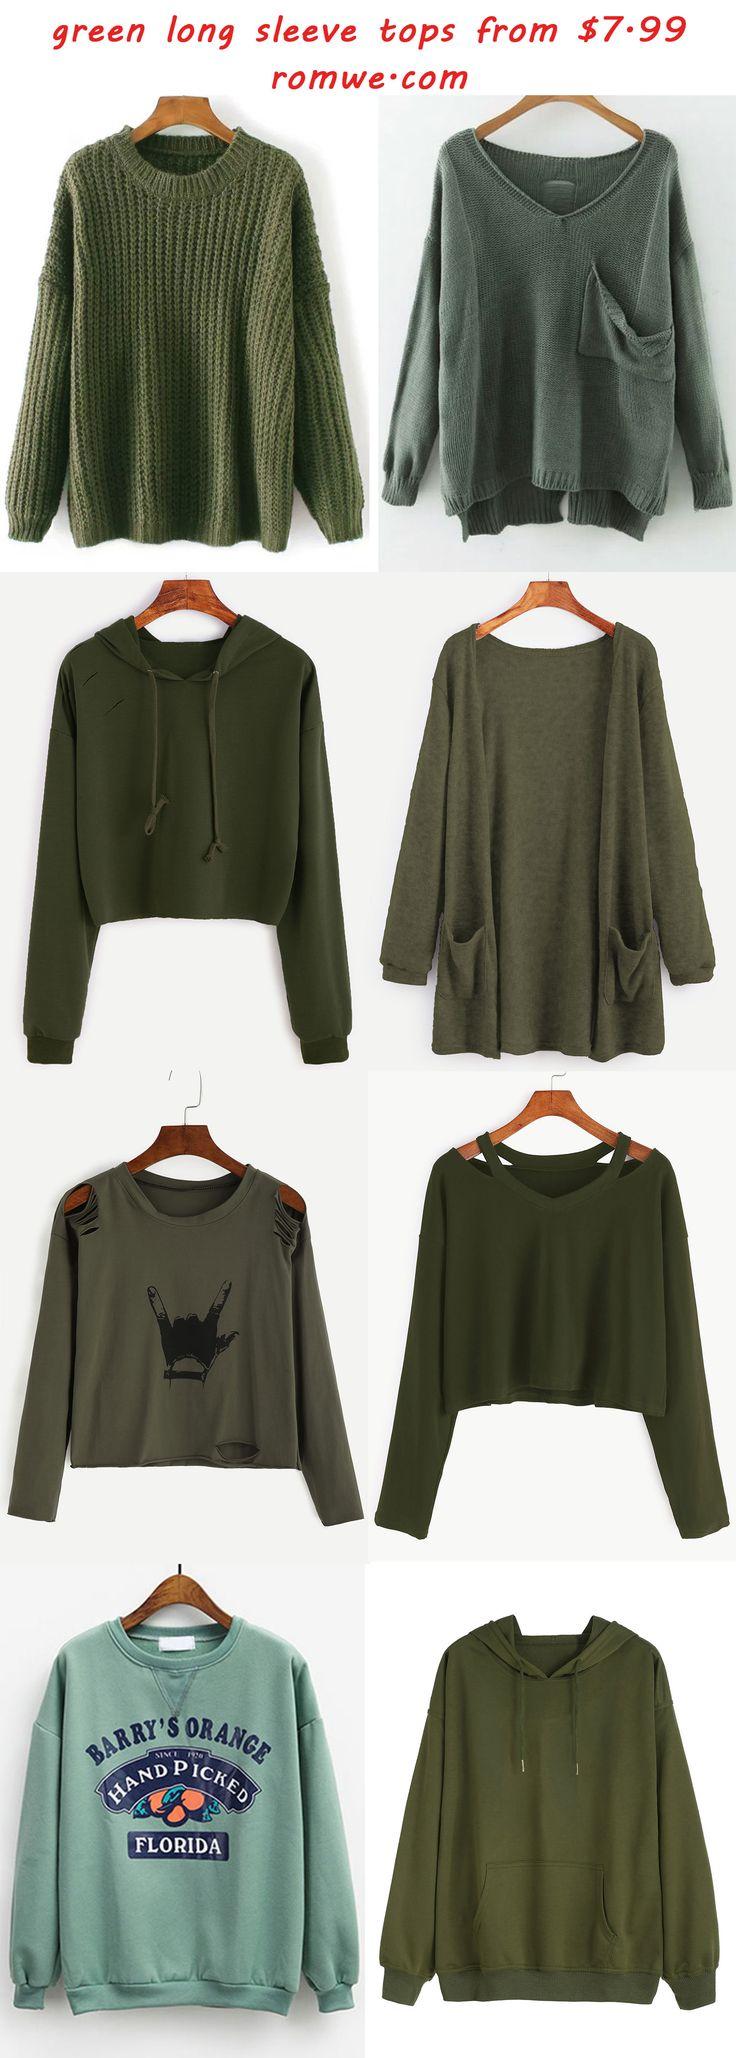 green long sleeve tops - romwe.com